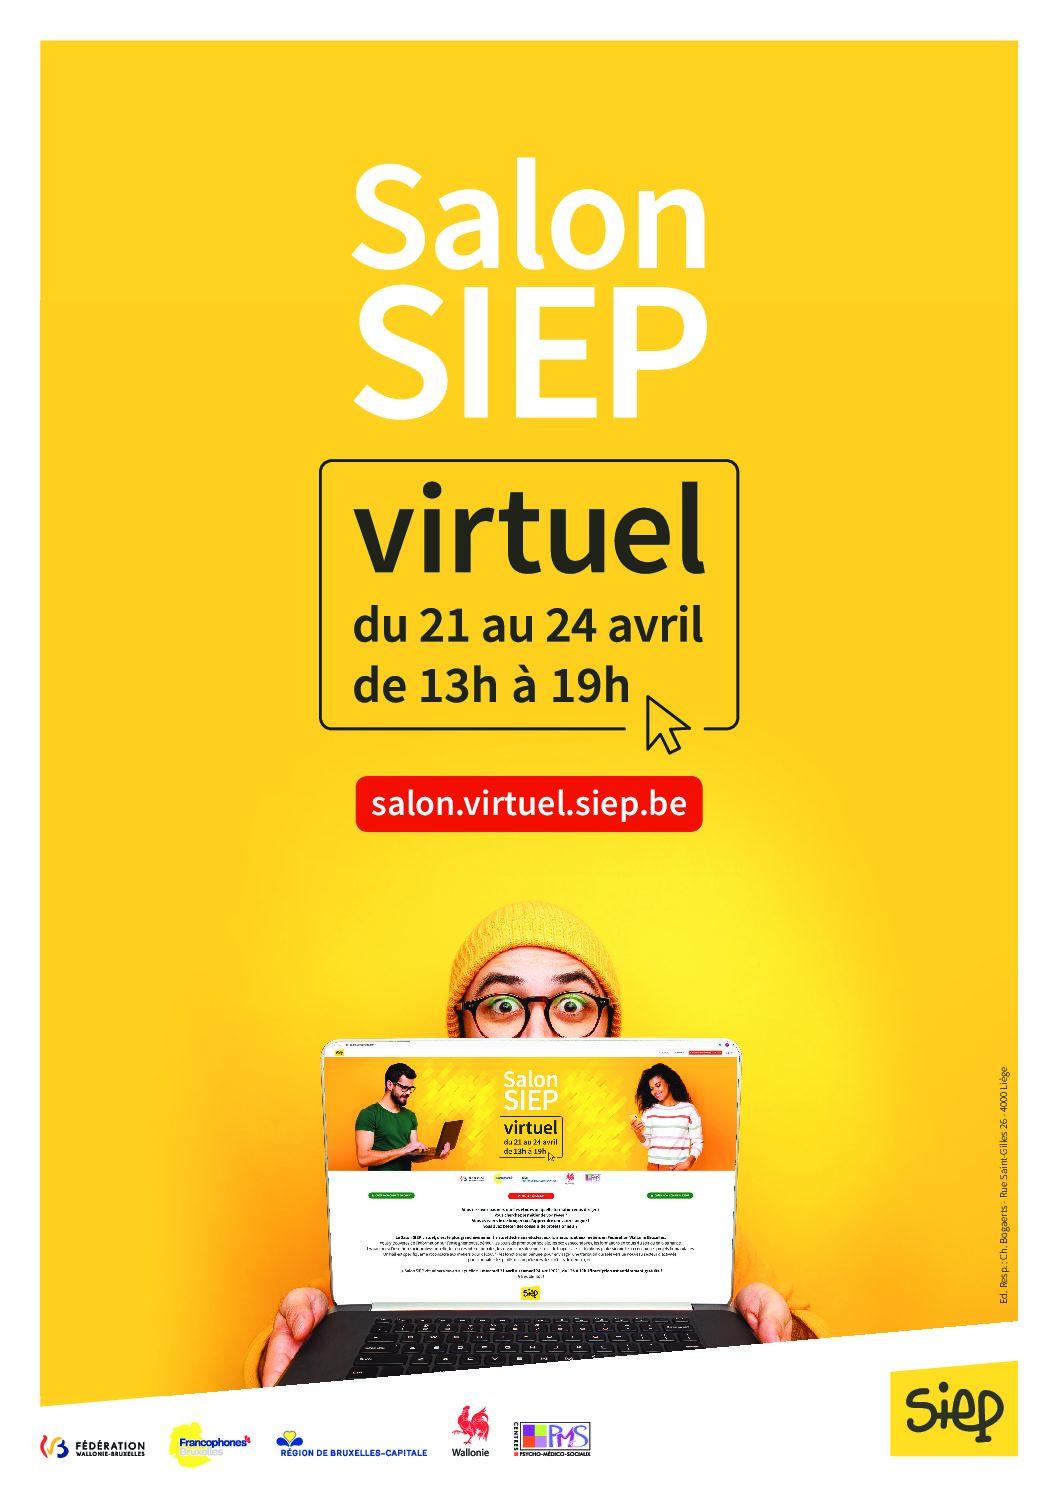 SALON SIEP virtuel – nous y serons!